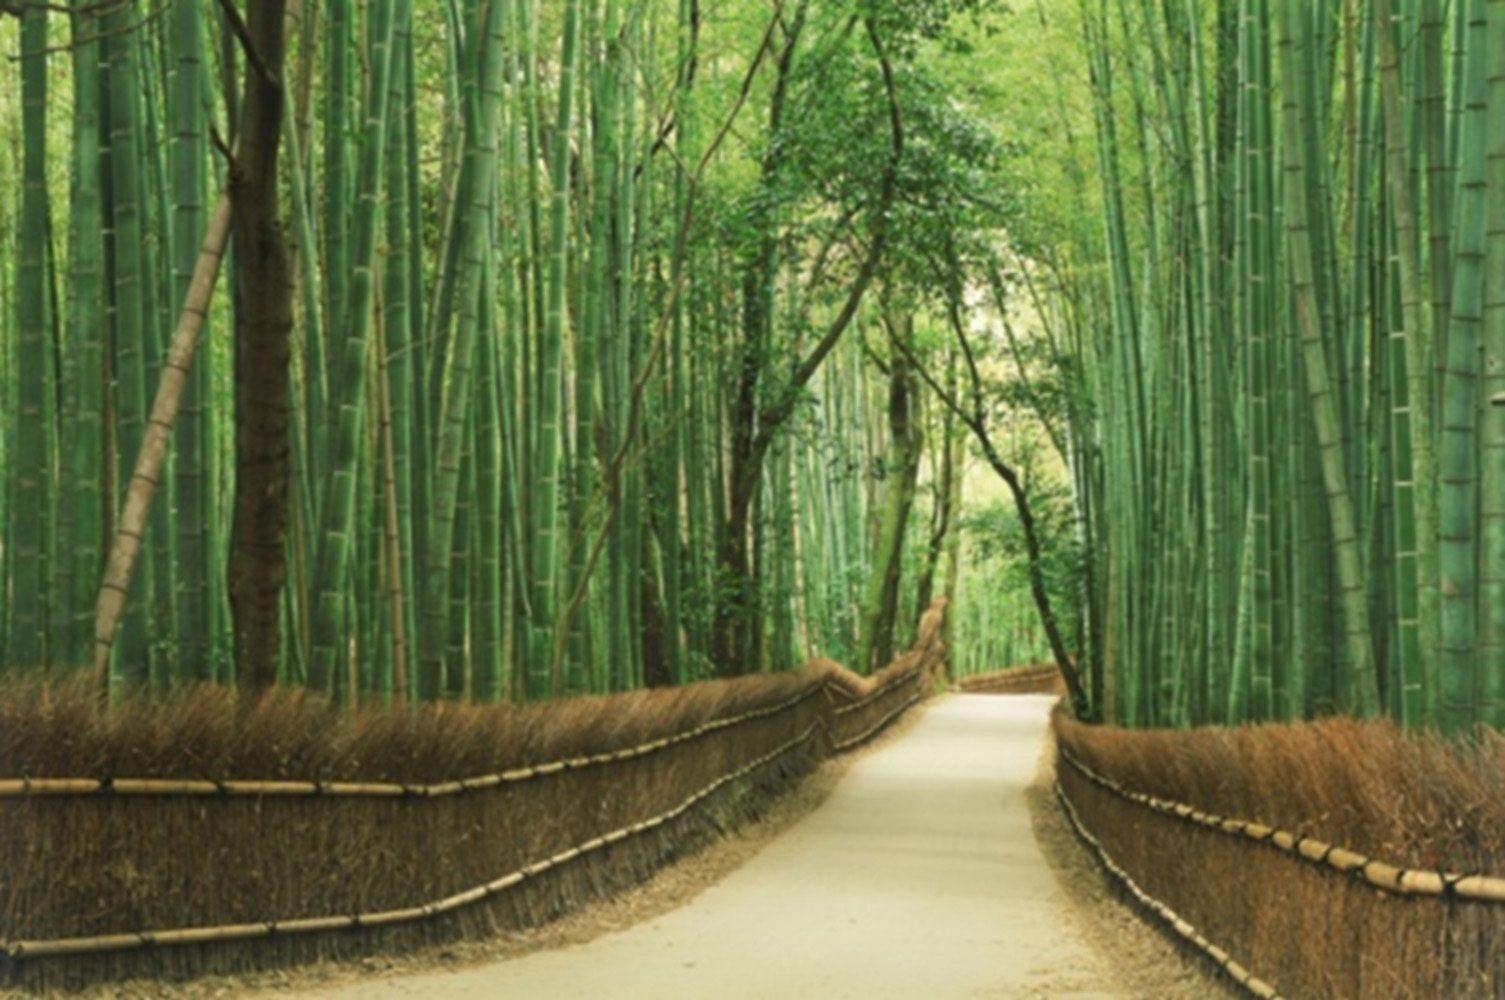 Home affaire Leinwandbild Bamboo Road«, 118/78 cm